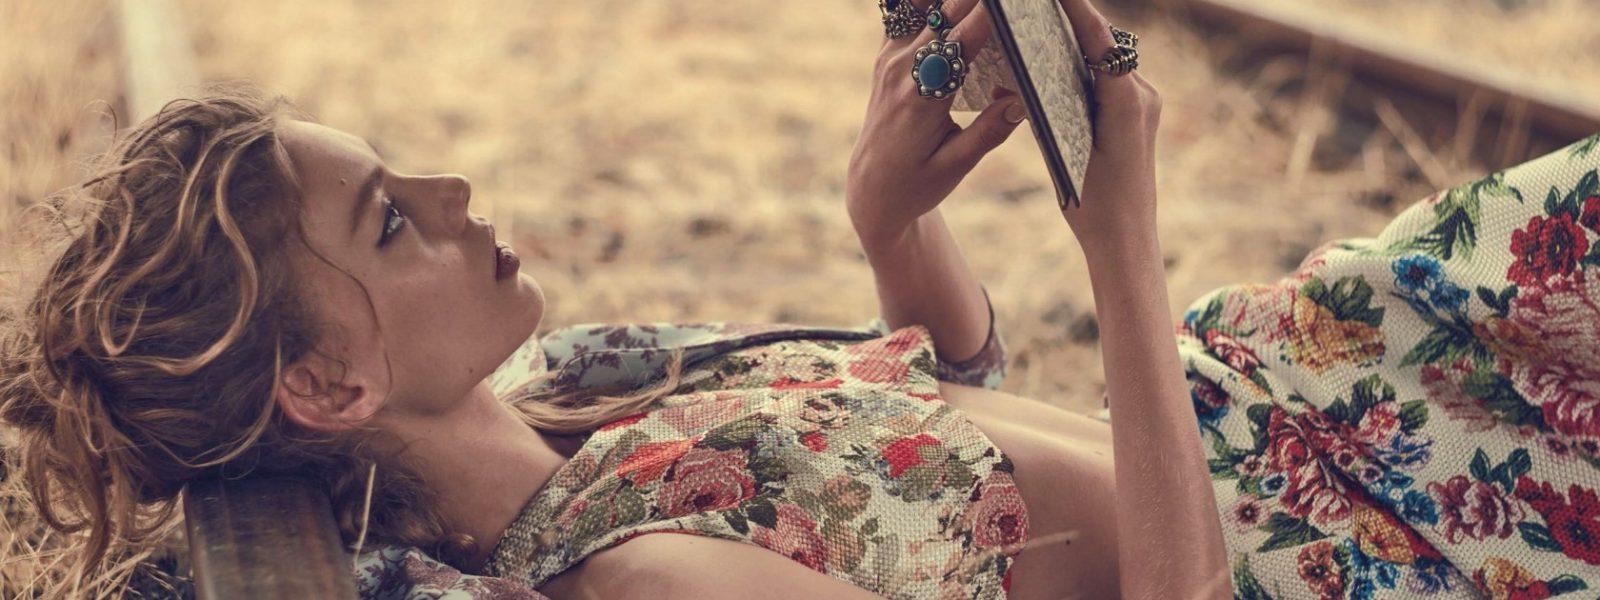 8 Ways To Keep Your Feminine Energy